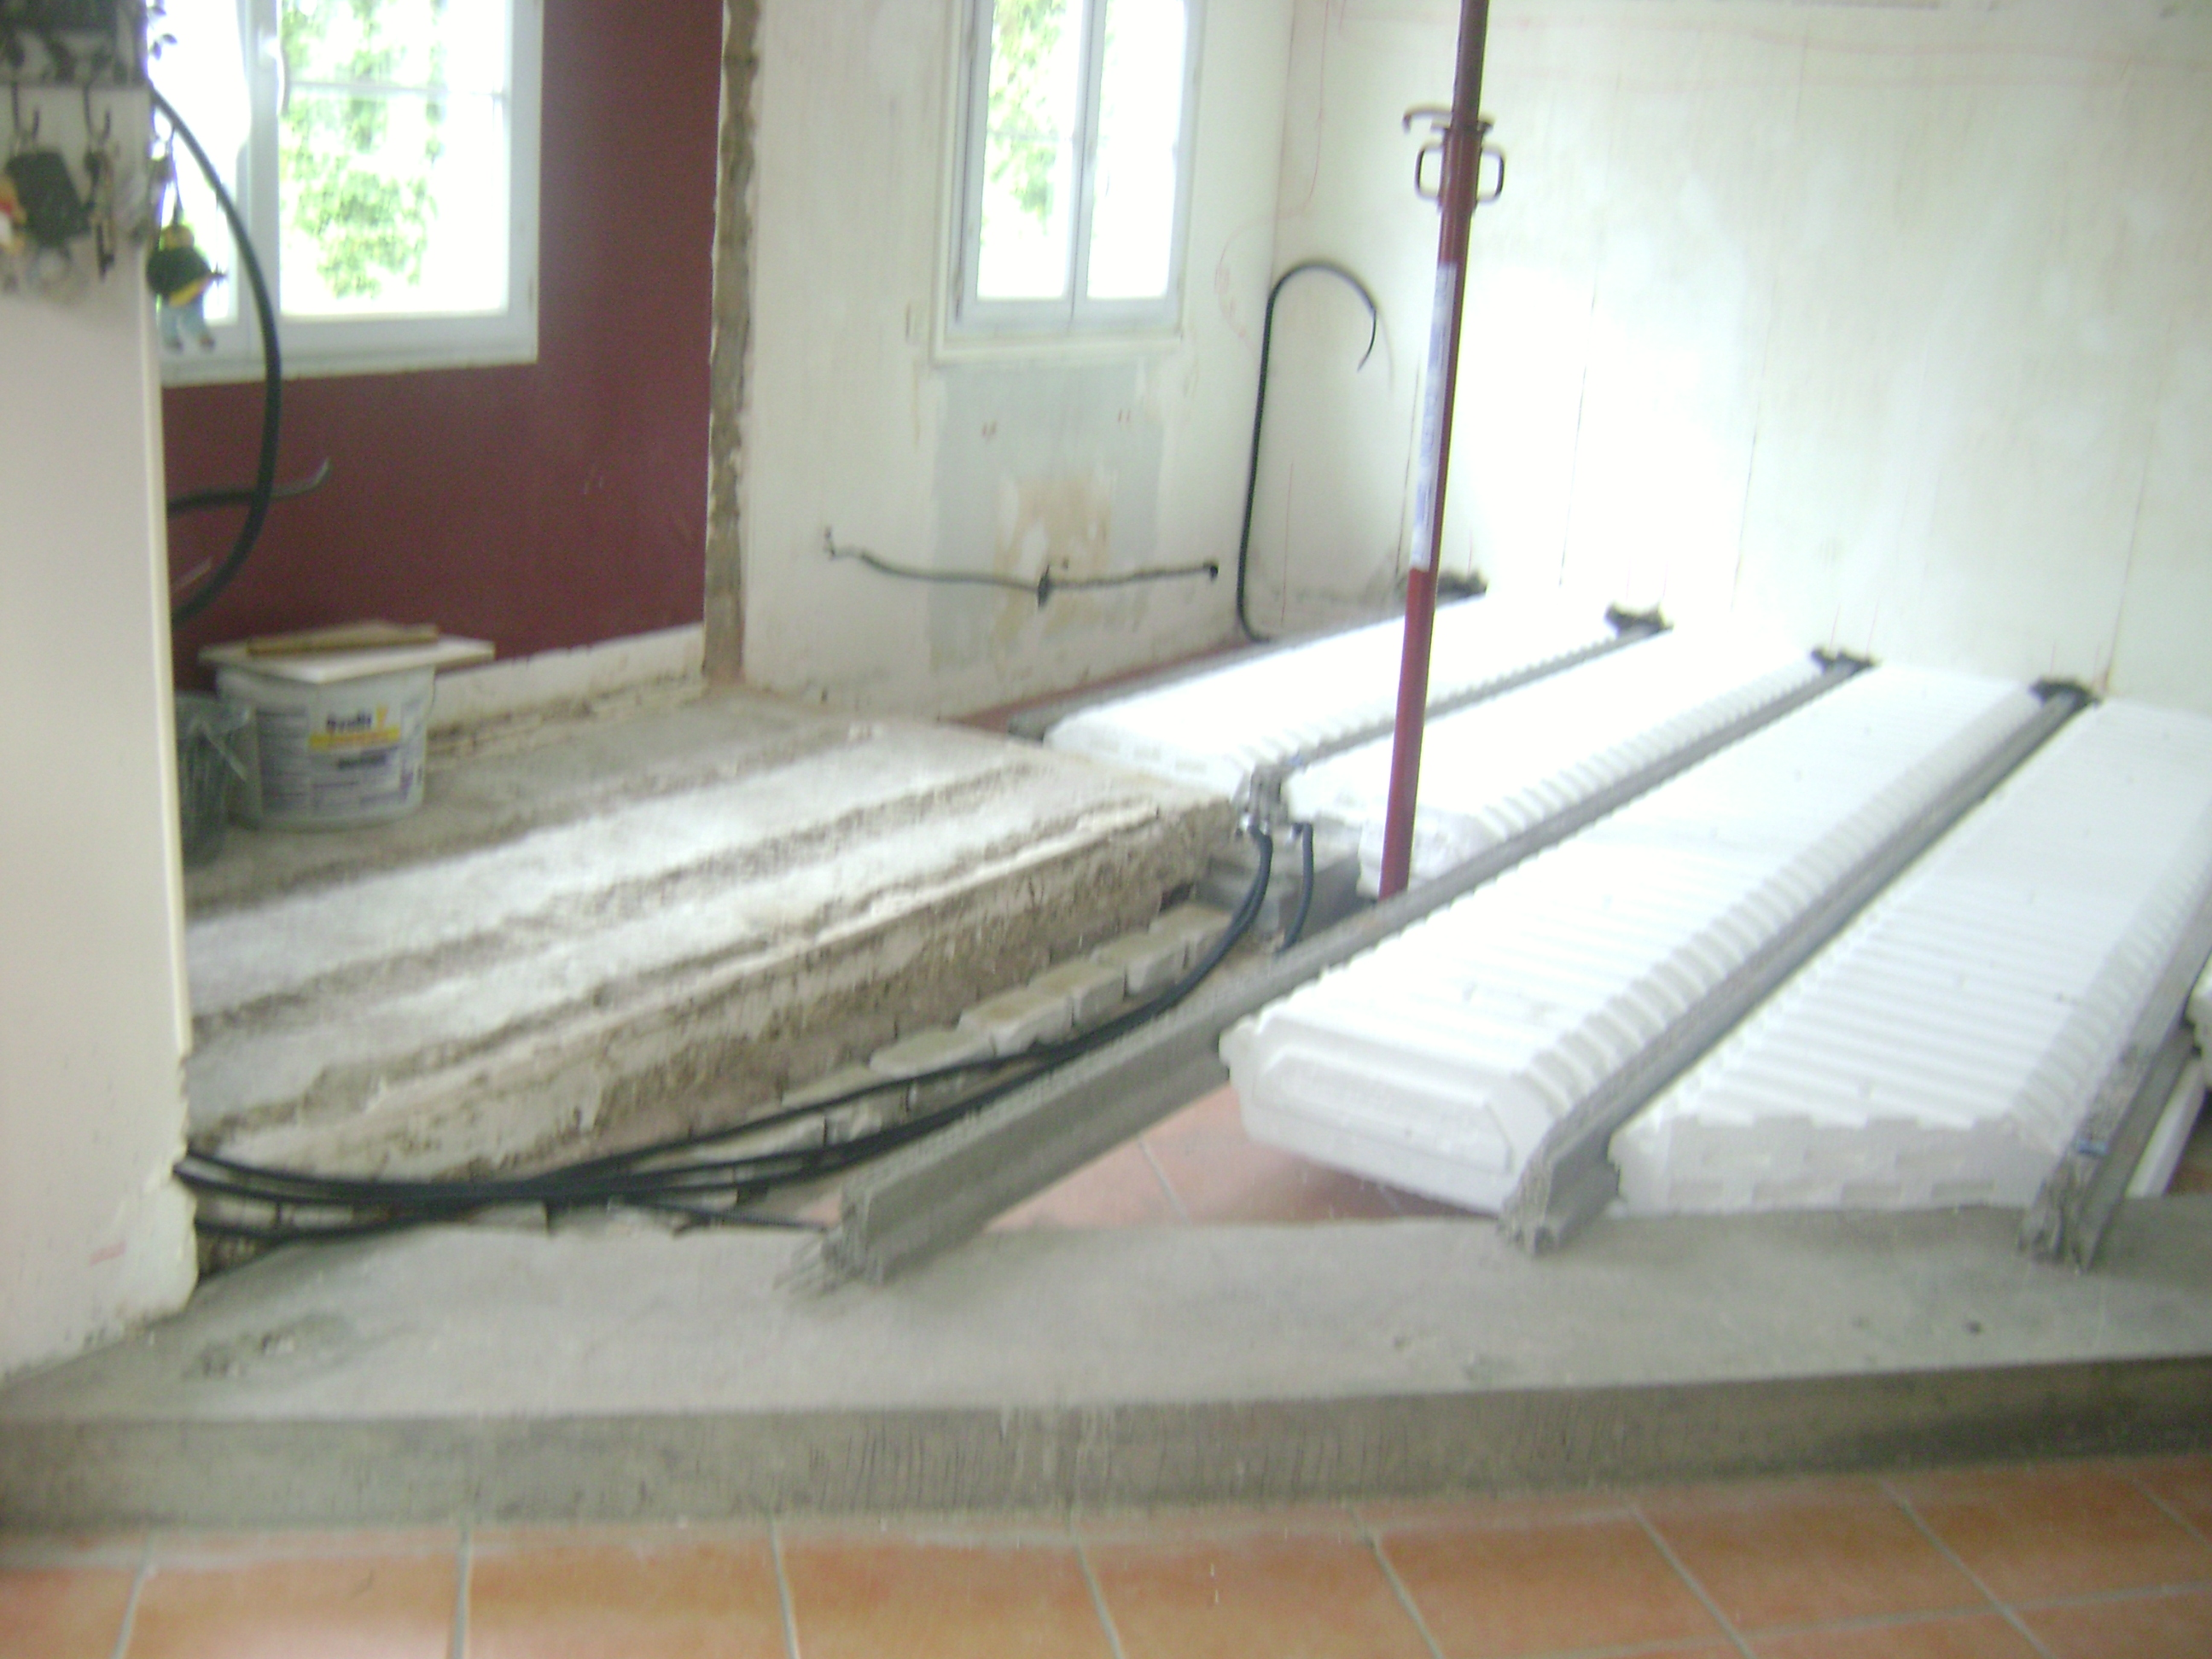 ma onnerie dalle b ton int rieur fr pillon 028 ikououbel. Black Bedroom Furniture Sets. Home Design Ideas